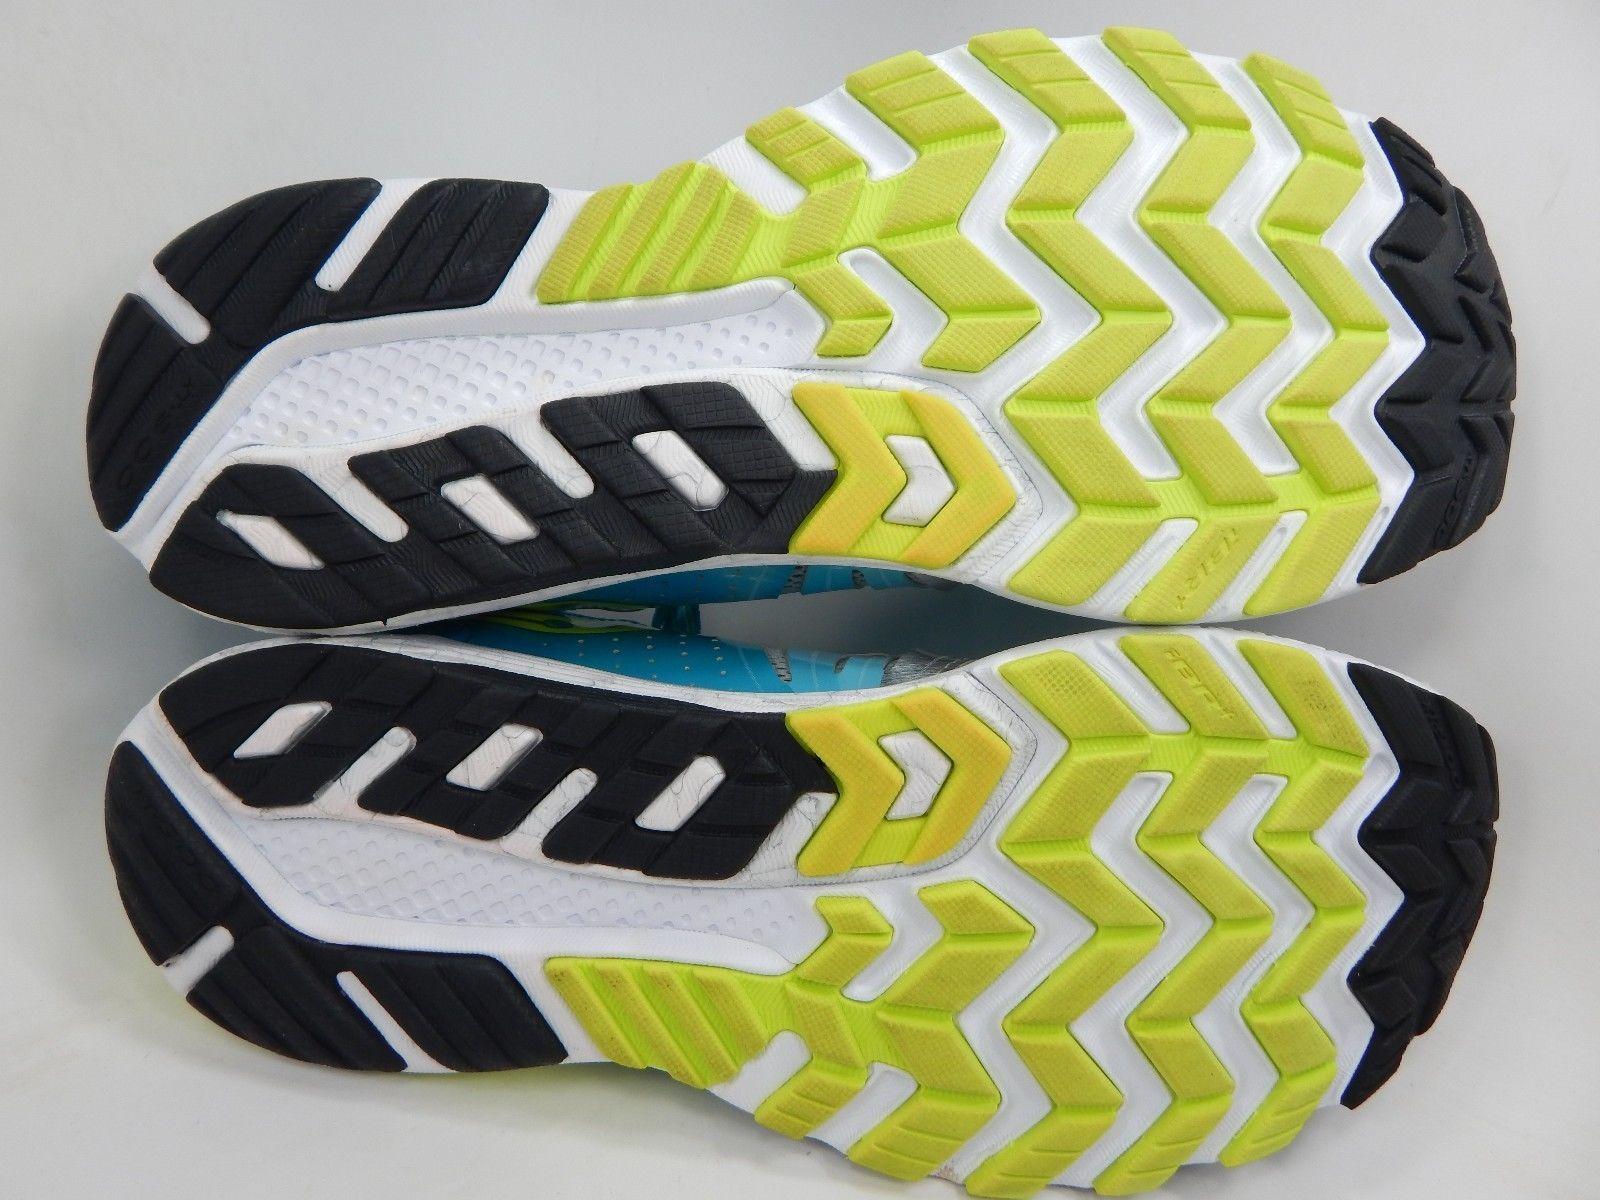 Saucony Hurricane ISO 2 Women's Running Shoes Size US 12 M (B) EU 44.5 S10293-1